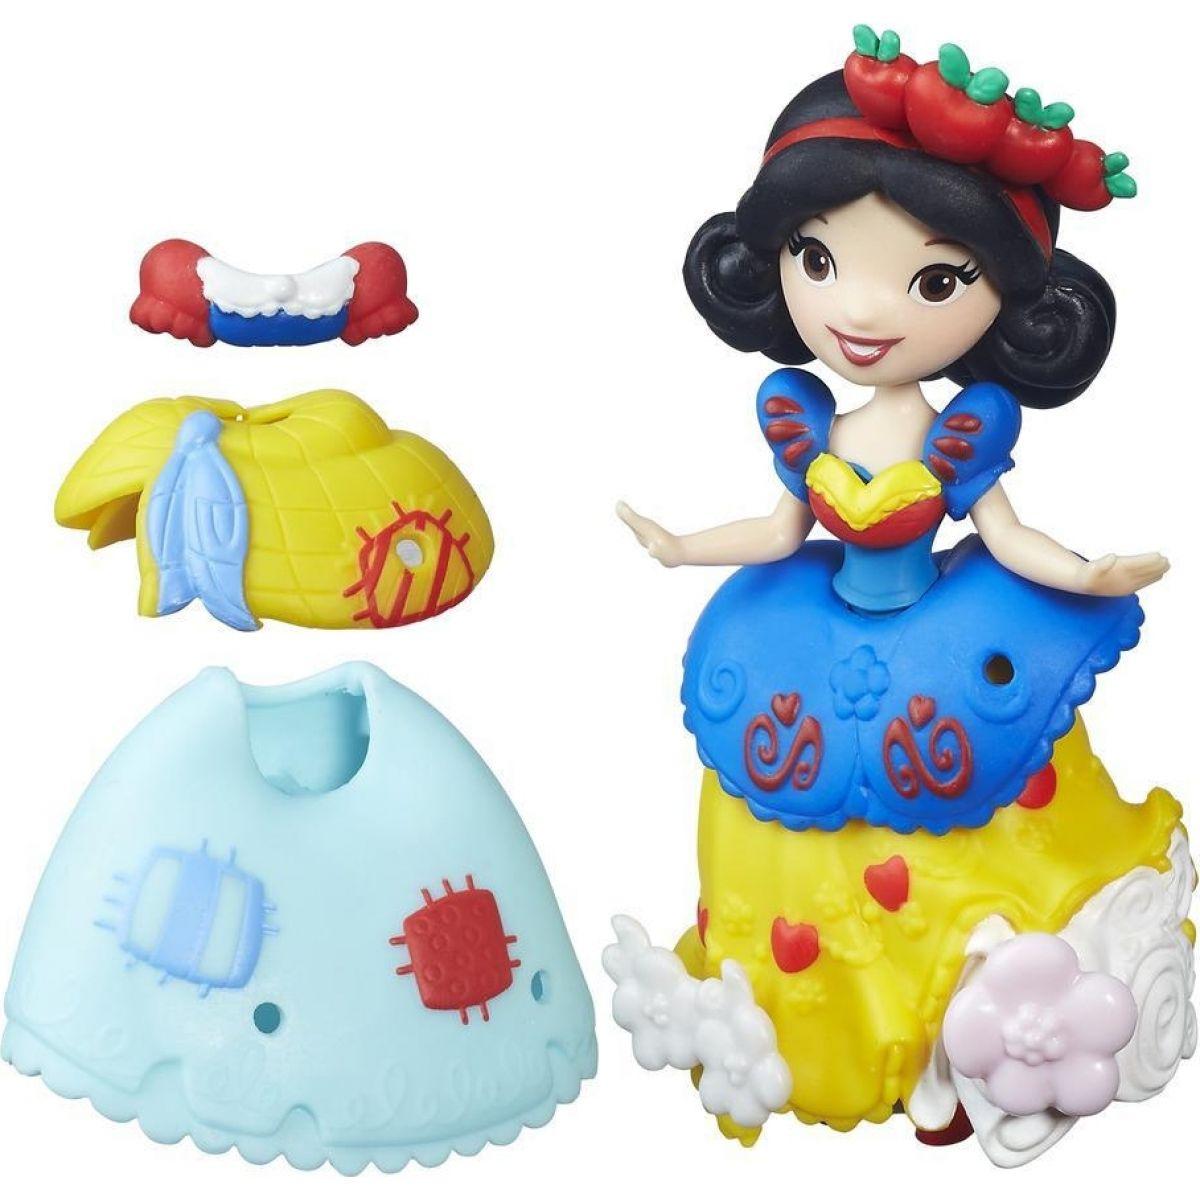 Hasbro Disney Princess Mini panenka s doplňky Sněhurka